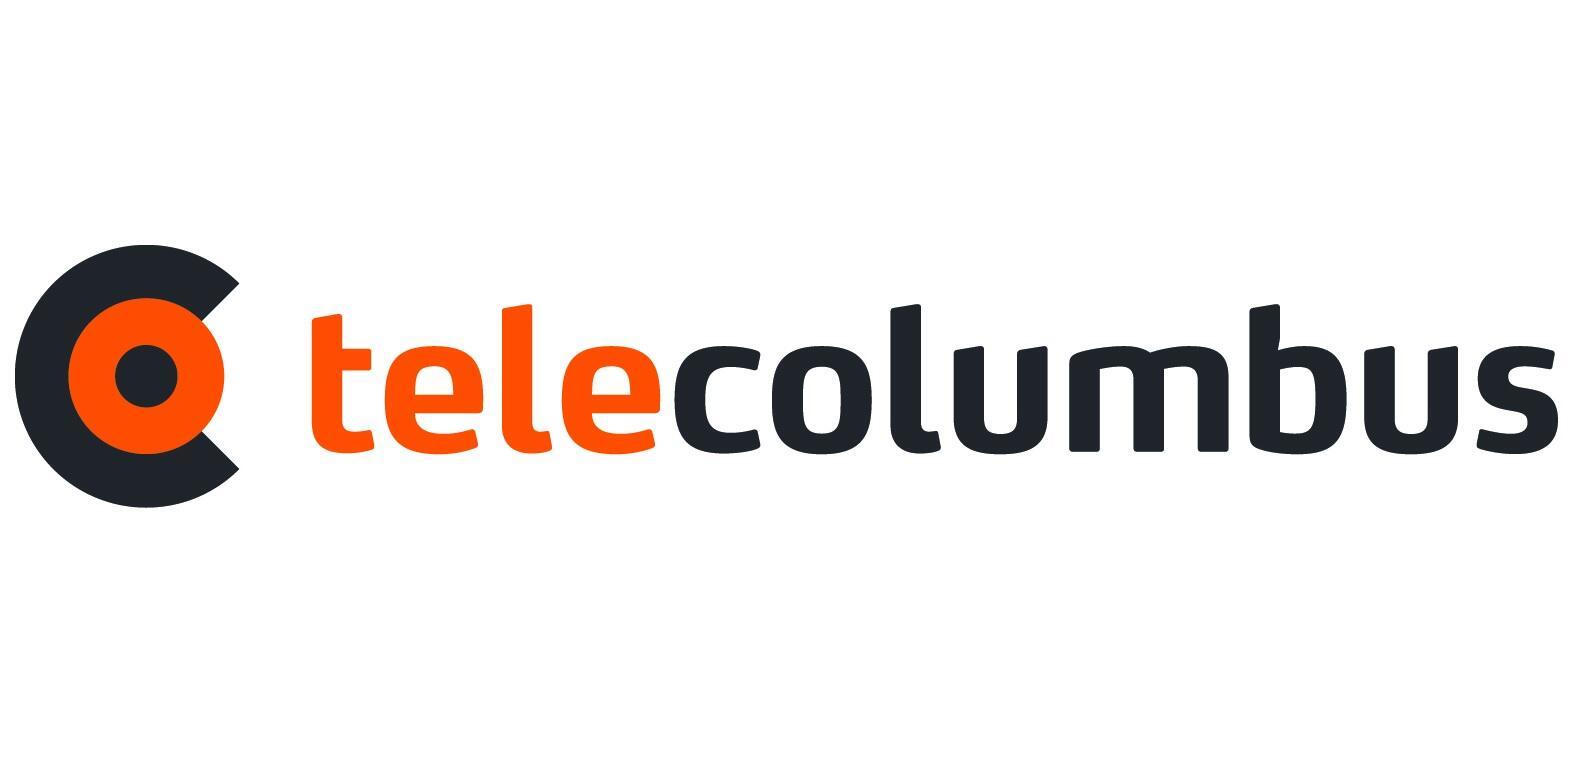 dsl internet Kabel provider tarif telecolumbus